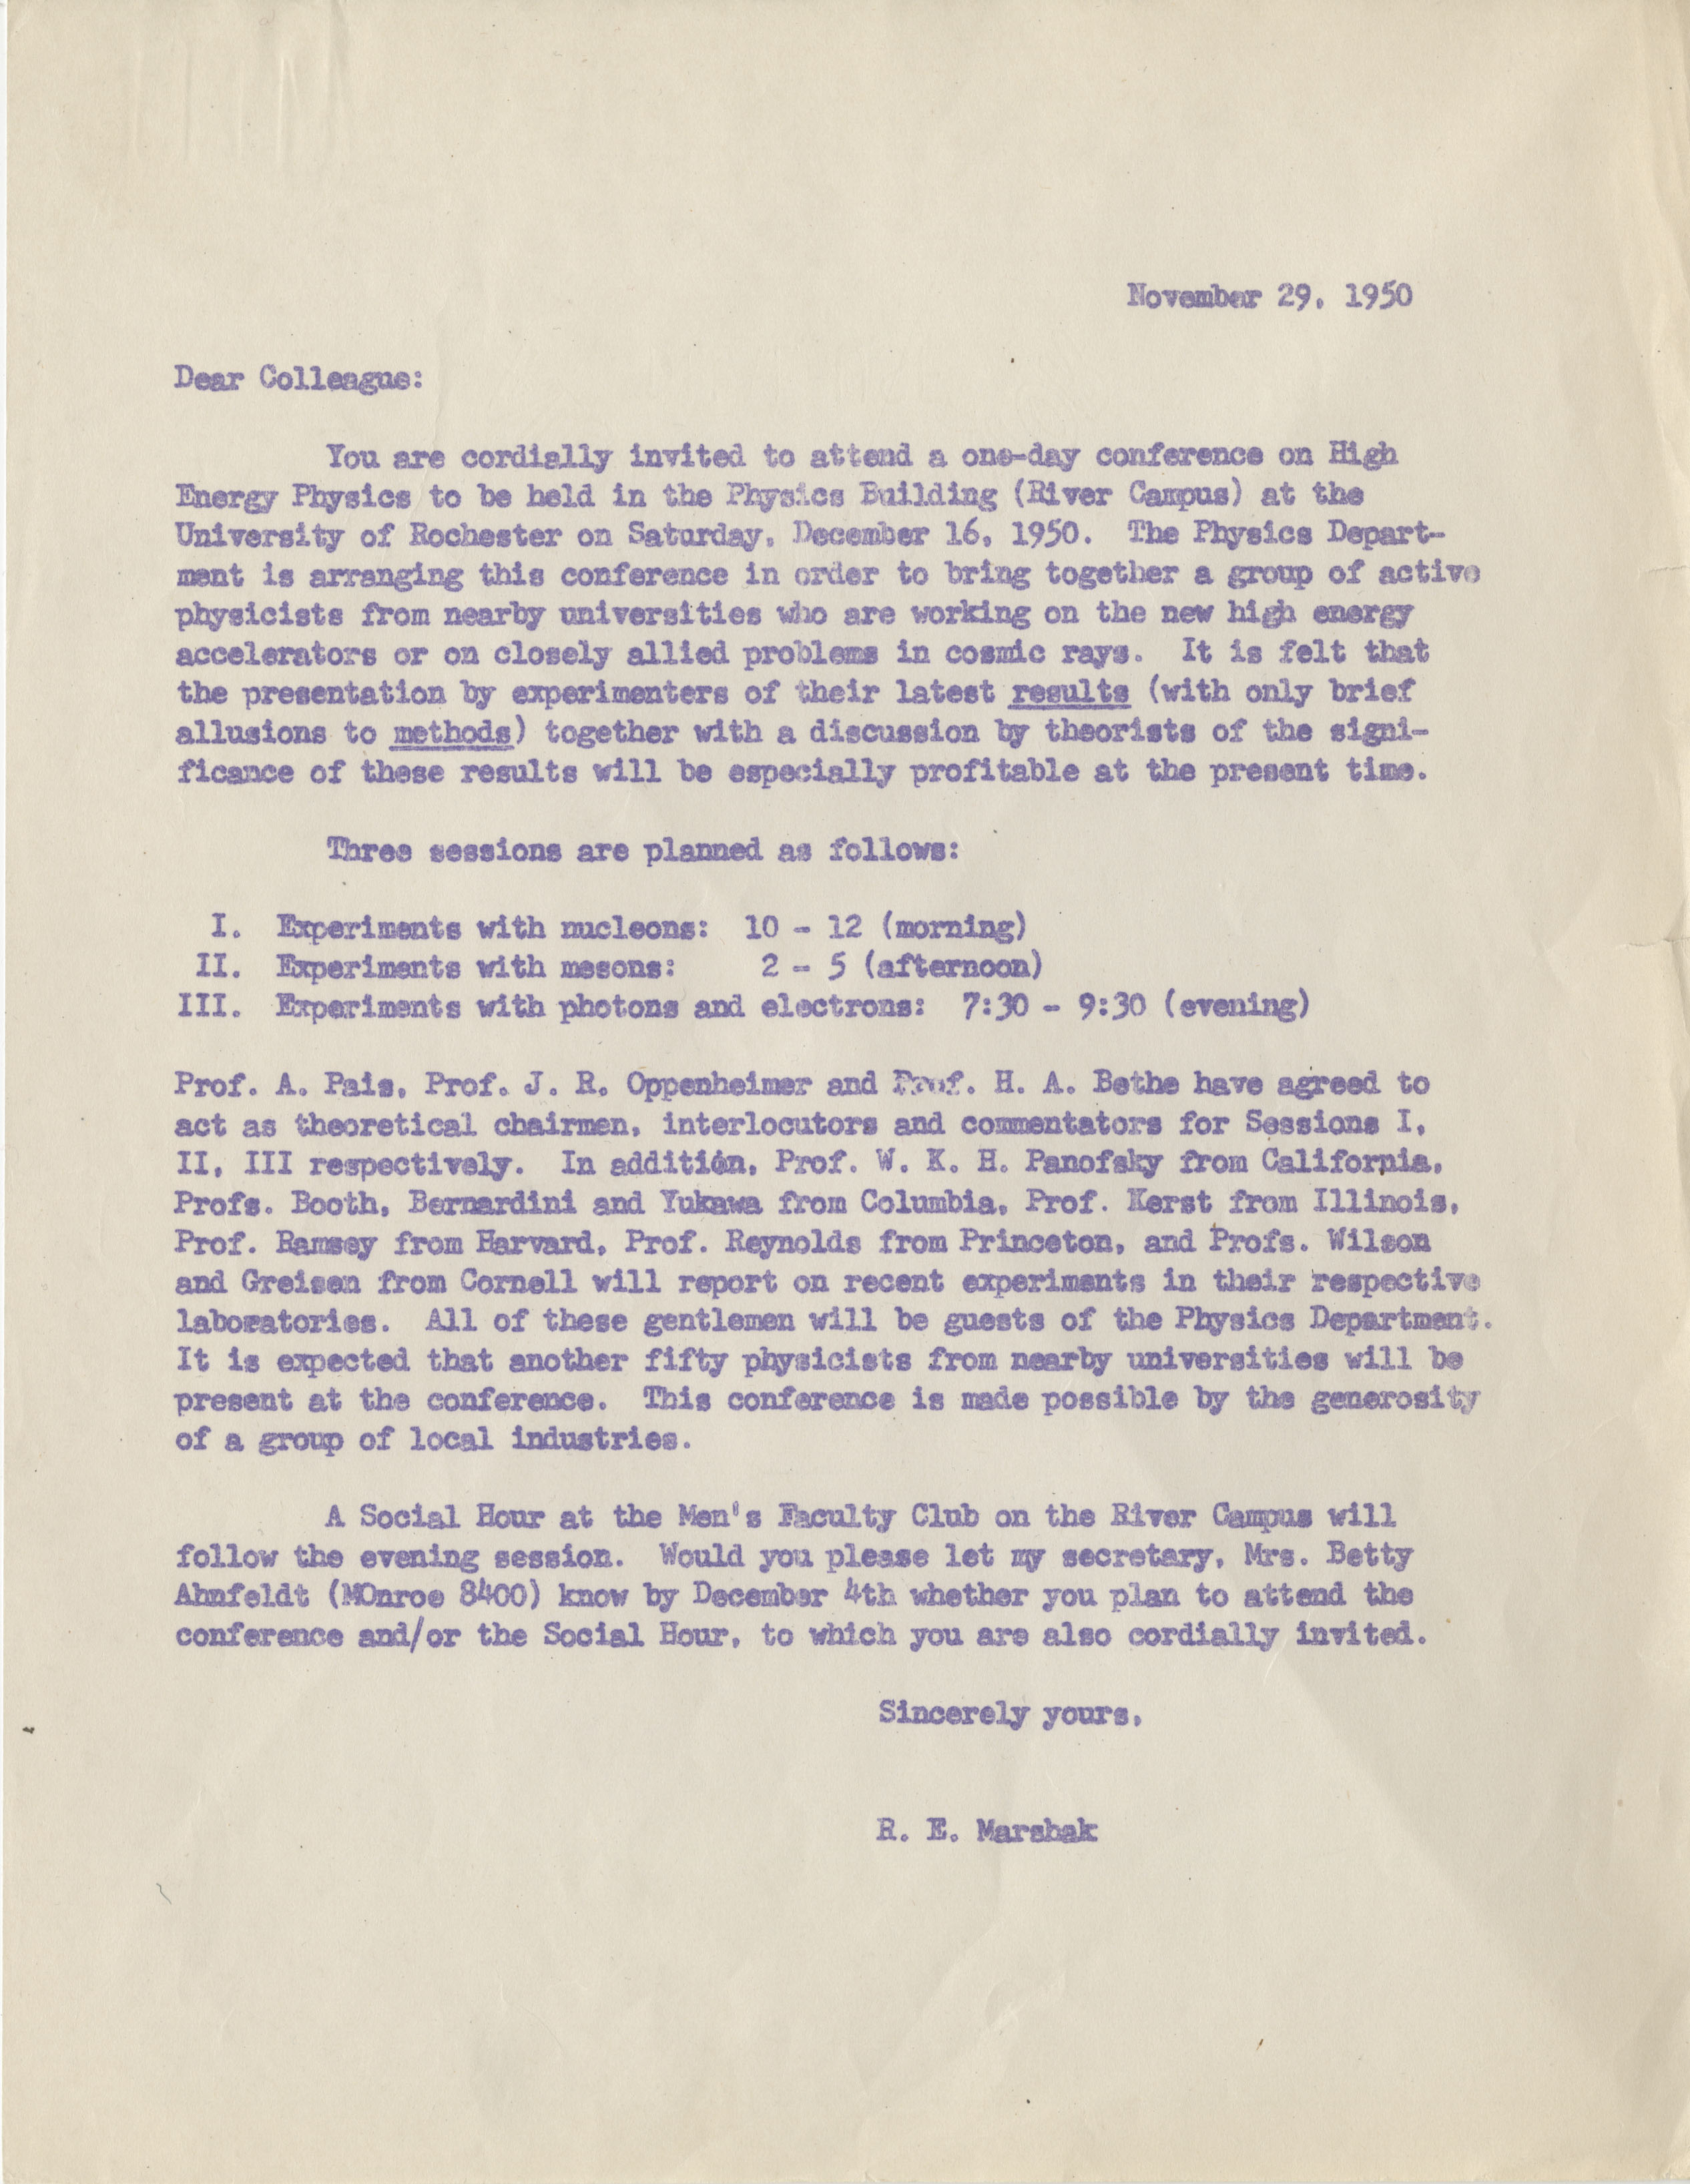 Conference Invitation, 29 November 1950